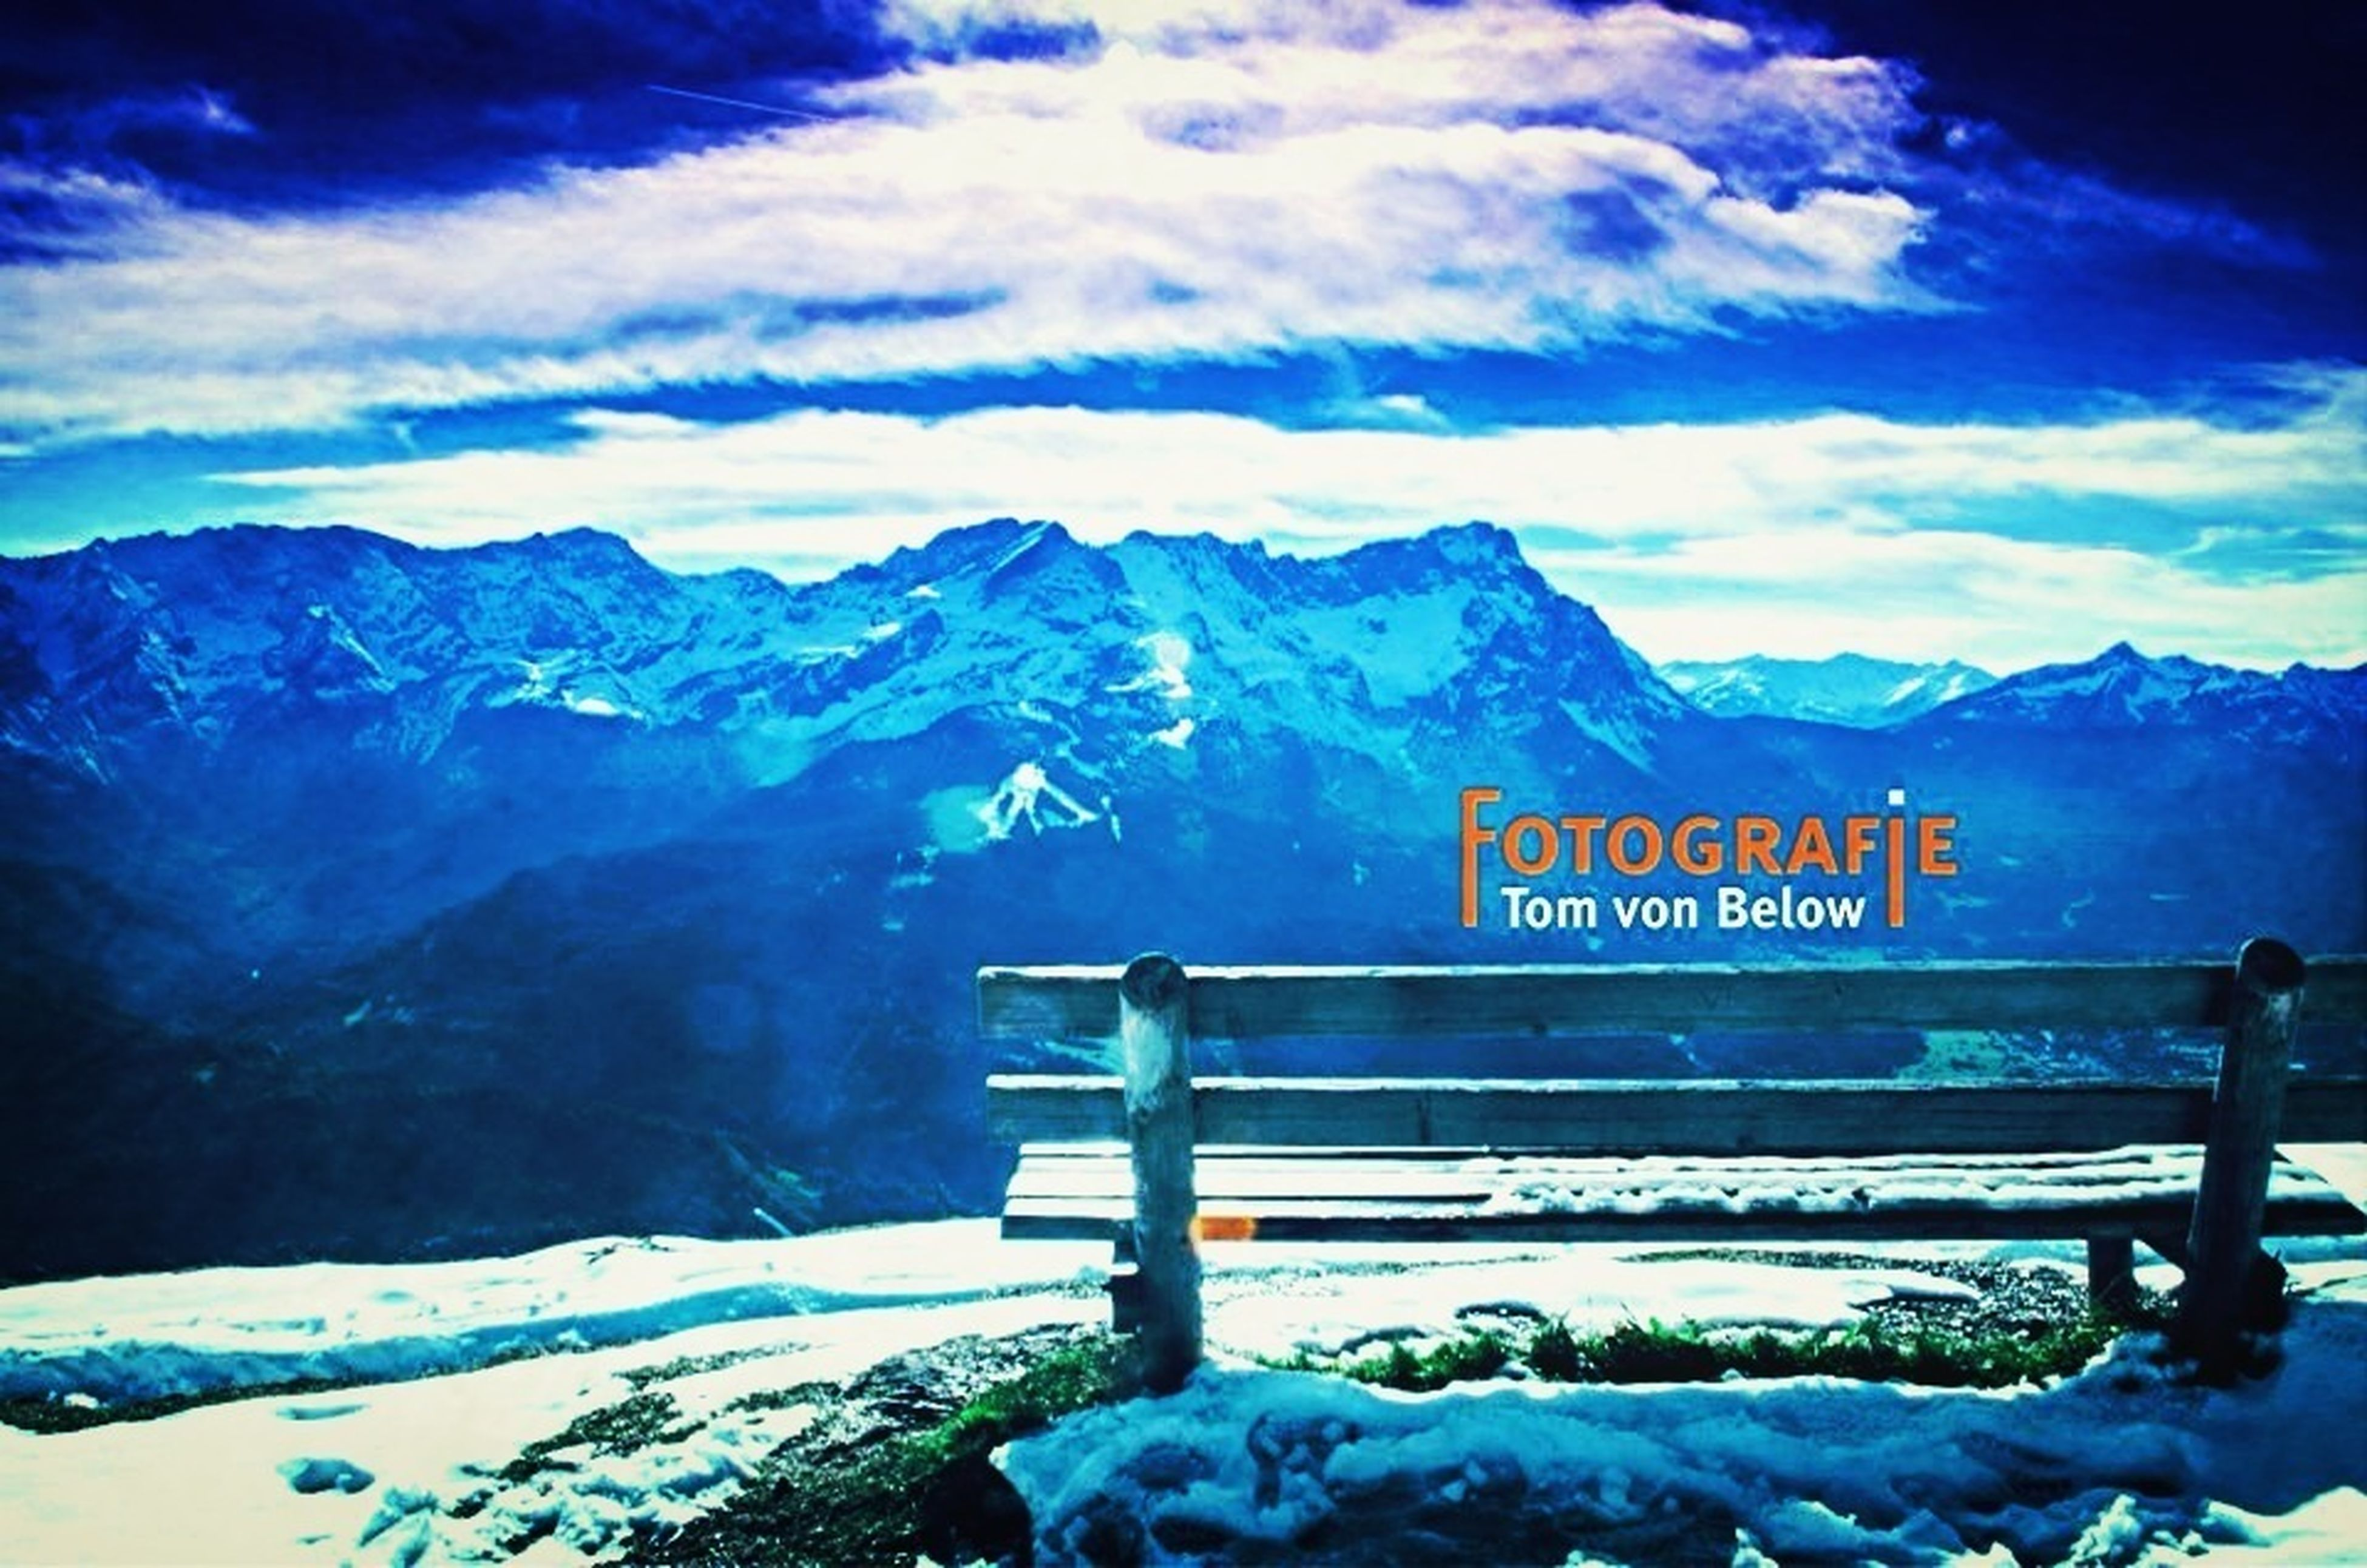 #mountain #sky #clouds #bench #love #tomvonbelowfotografie